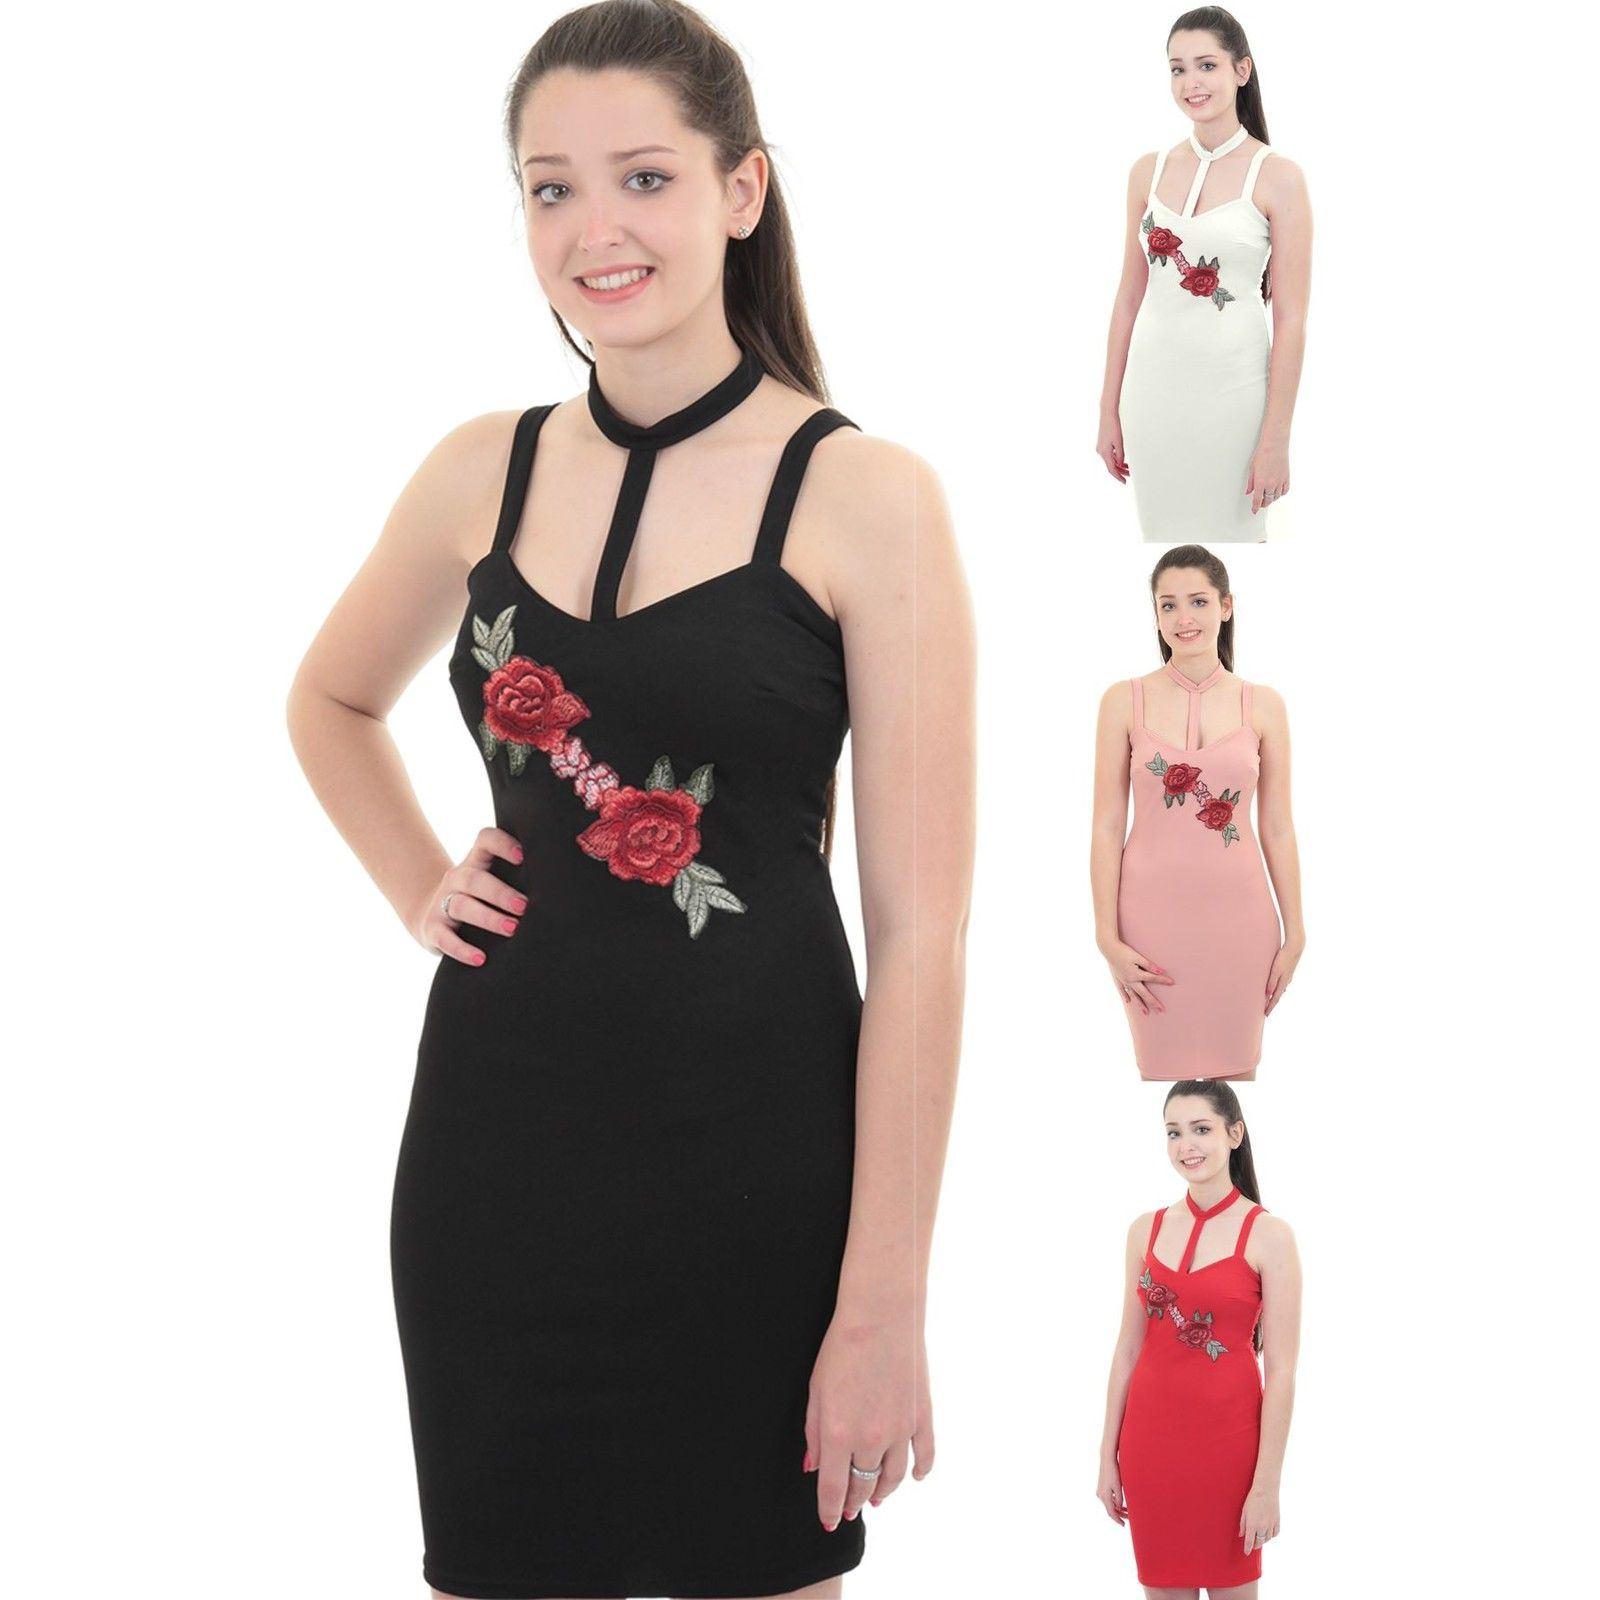 Details about Ladies Sleeveless Choker V Neck Harness Floral Rose Bodycon  Short Mini Dress 69e3e8a432dc